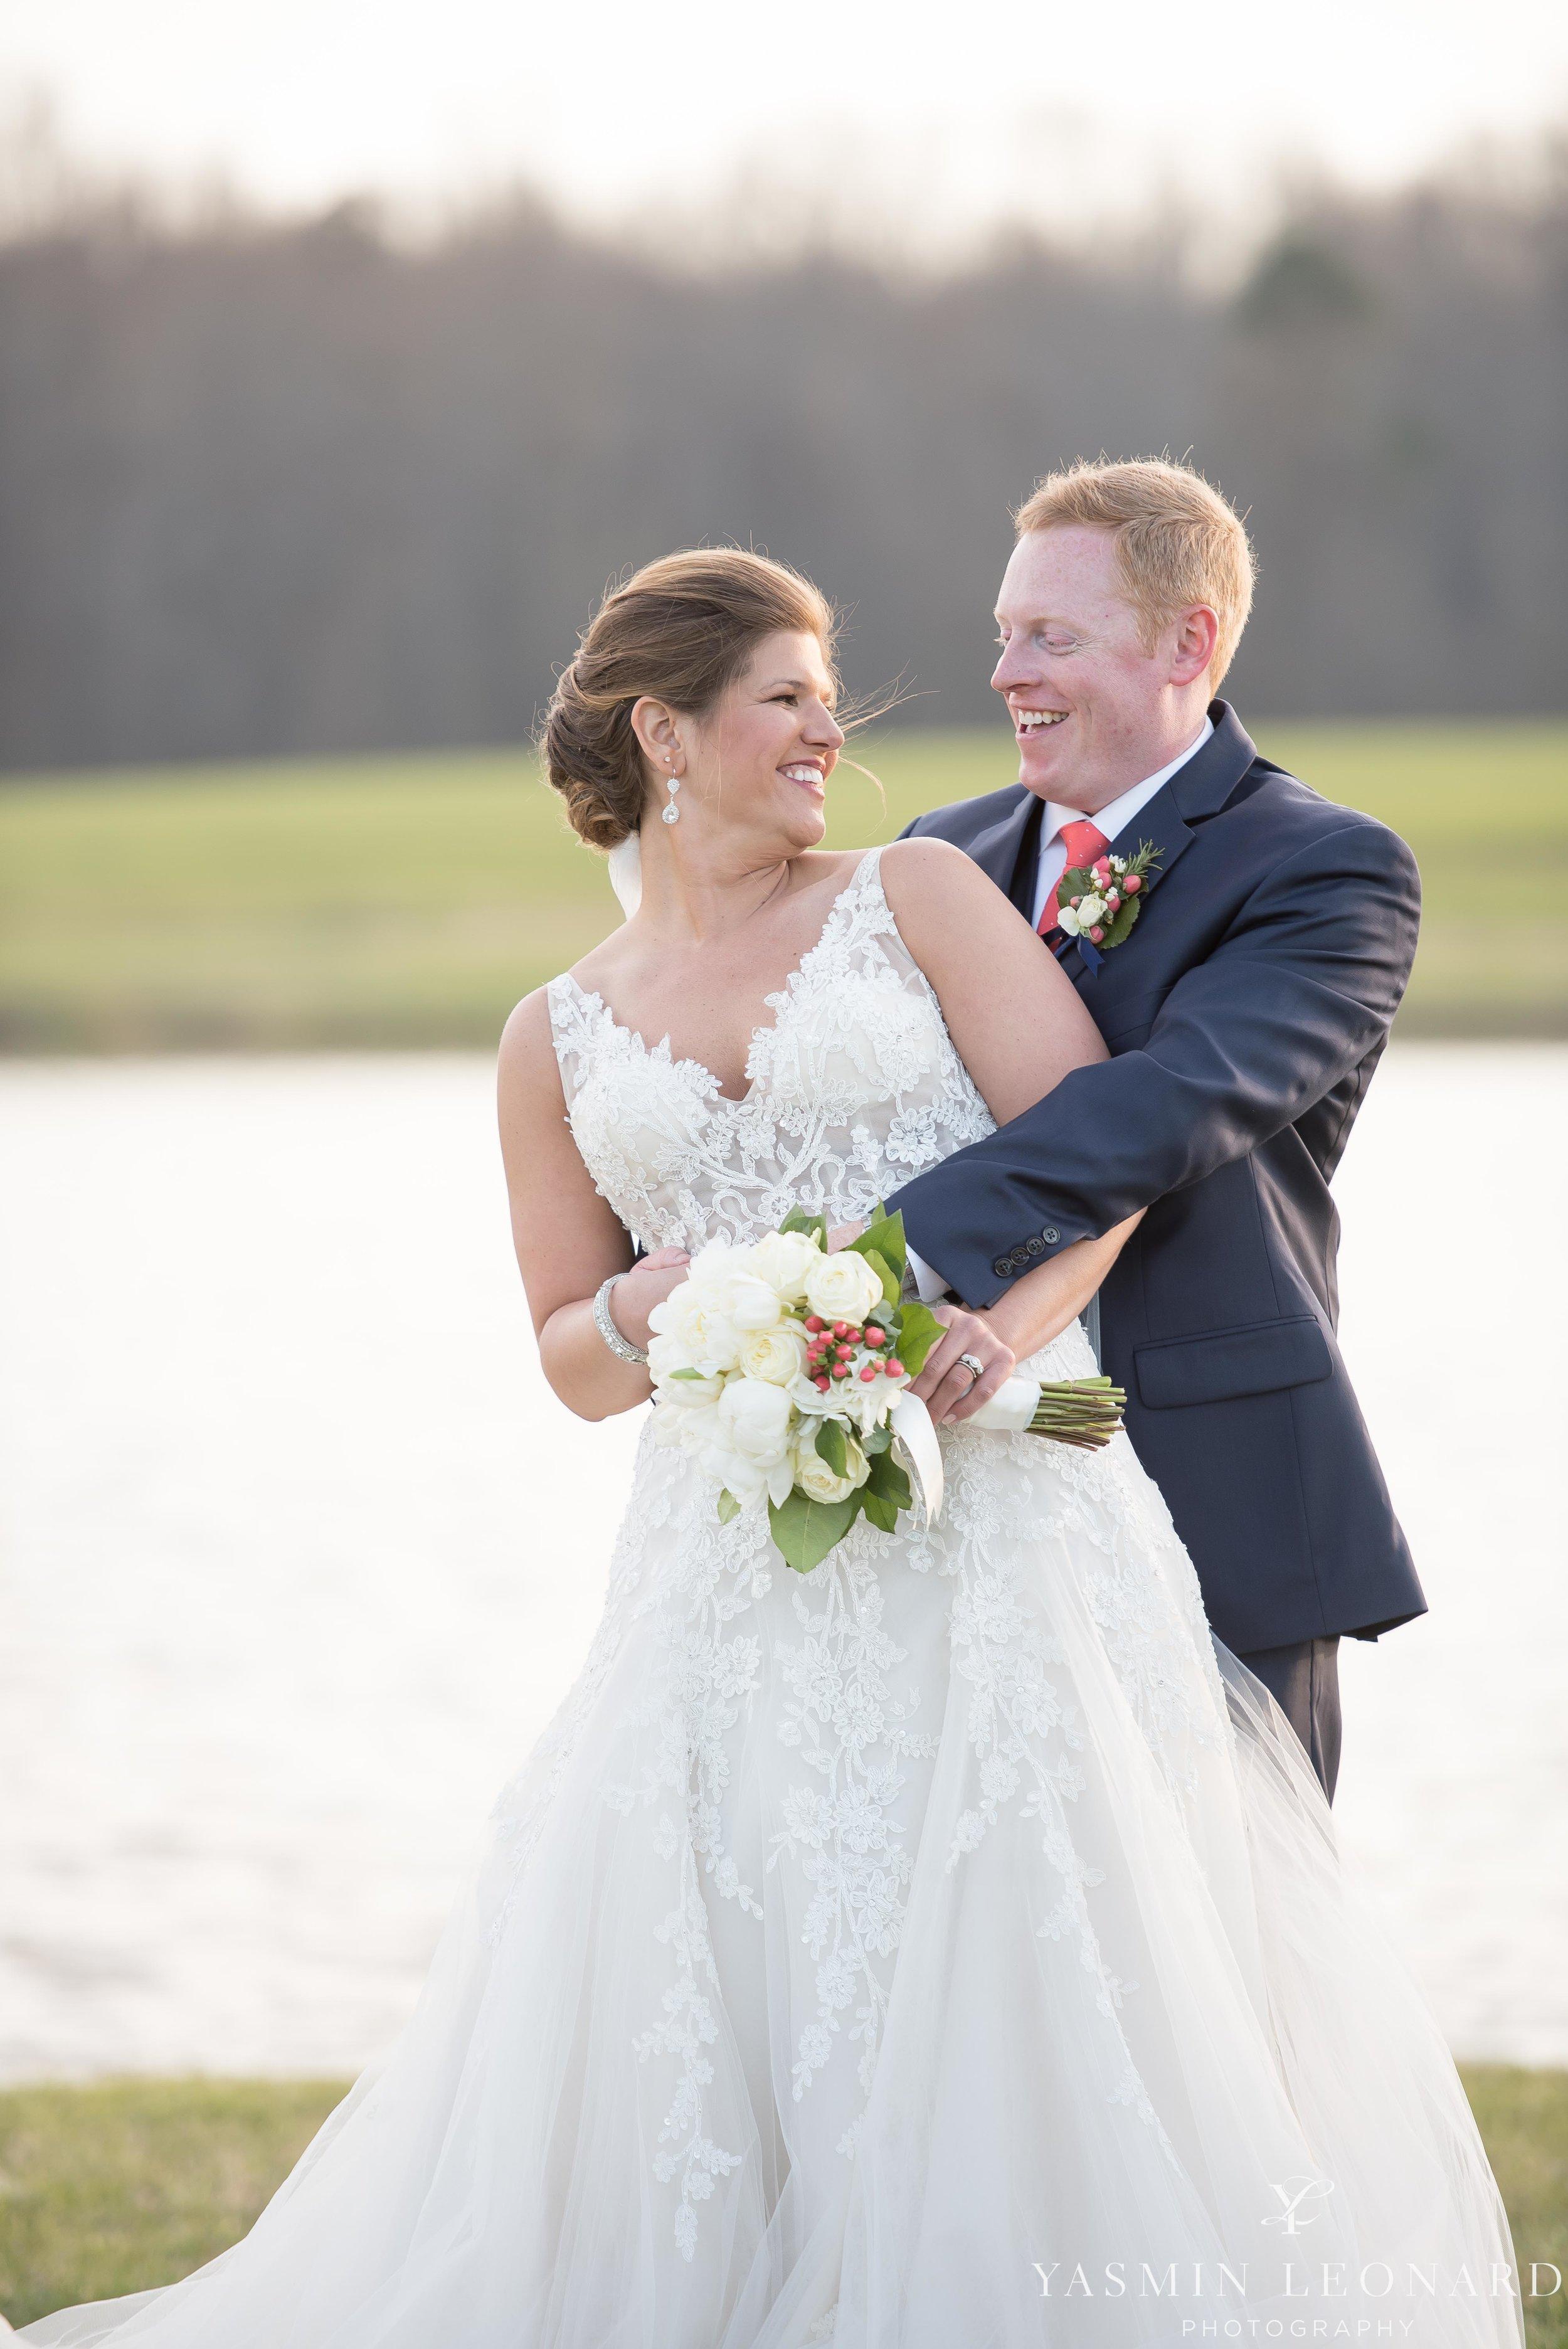 Adaumont Farm - Adaumont Farm Weddings - Trinity Weddings - NC Weddings - Yasmin Leonard Photography-44.jpg